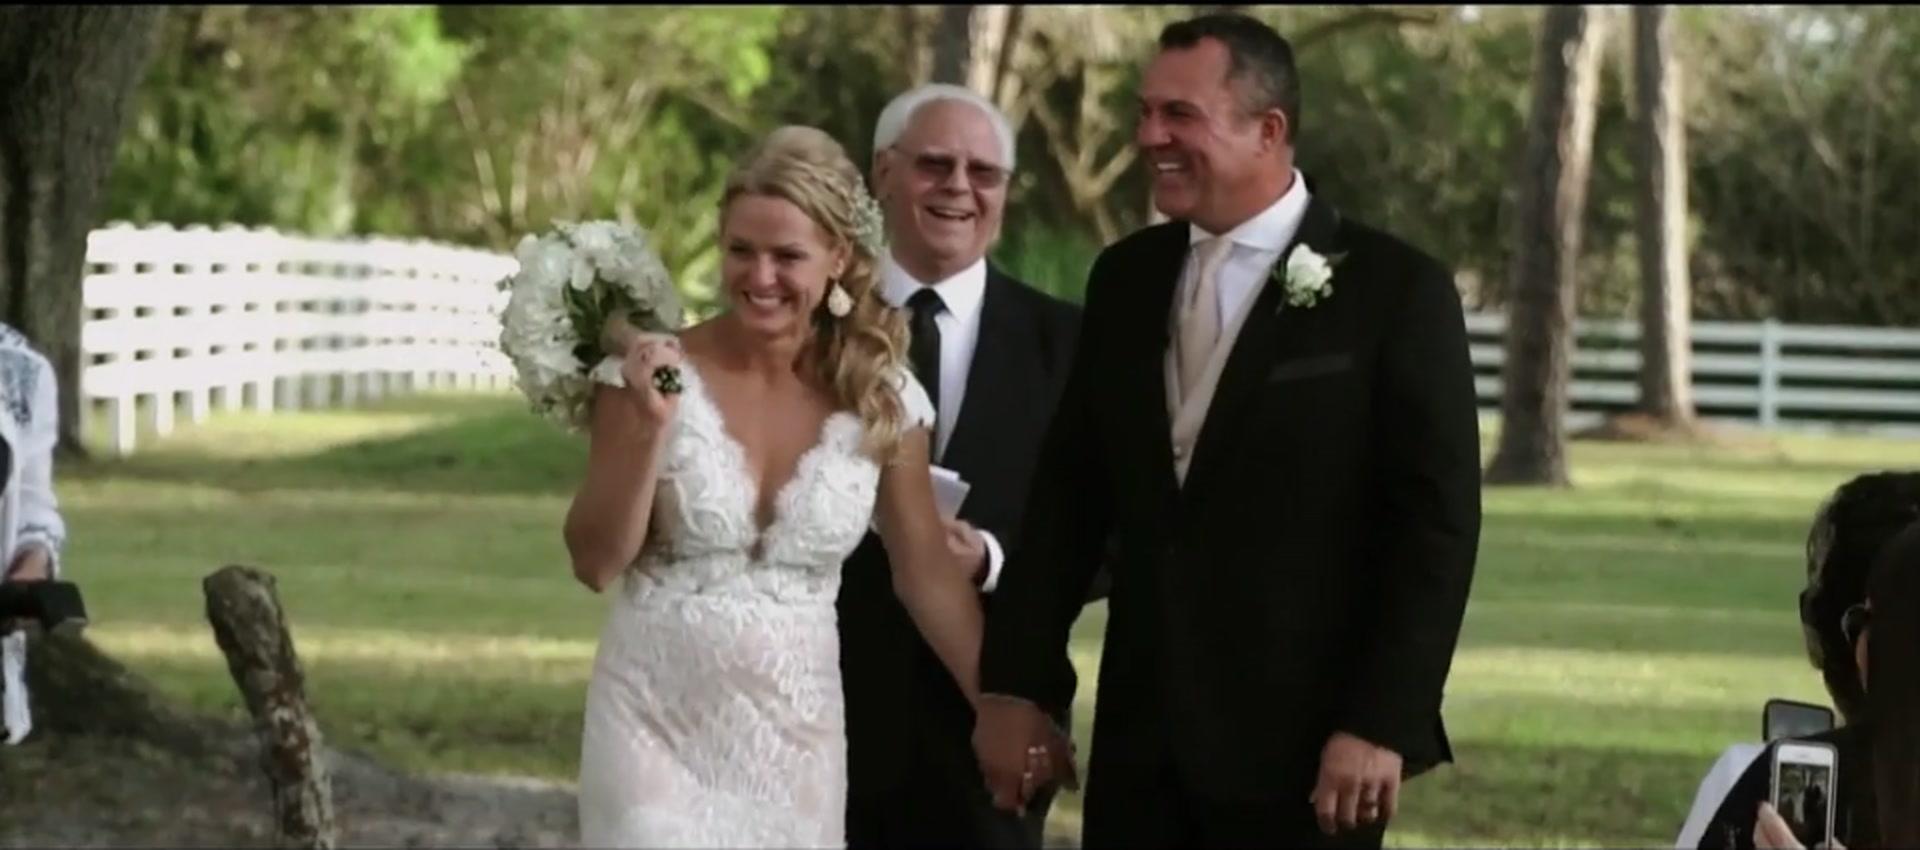 Trish + Bobby | Malabar, Florida | A Family Farm